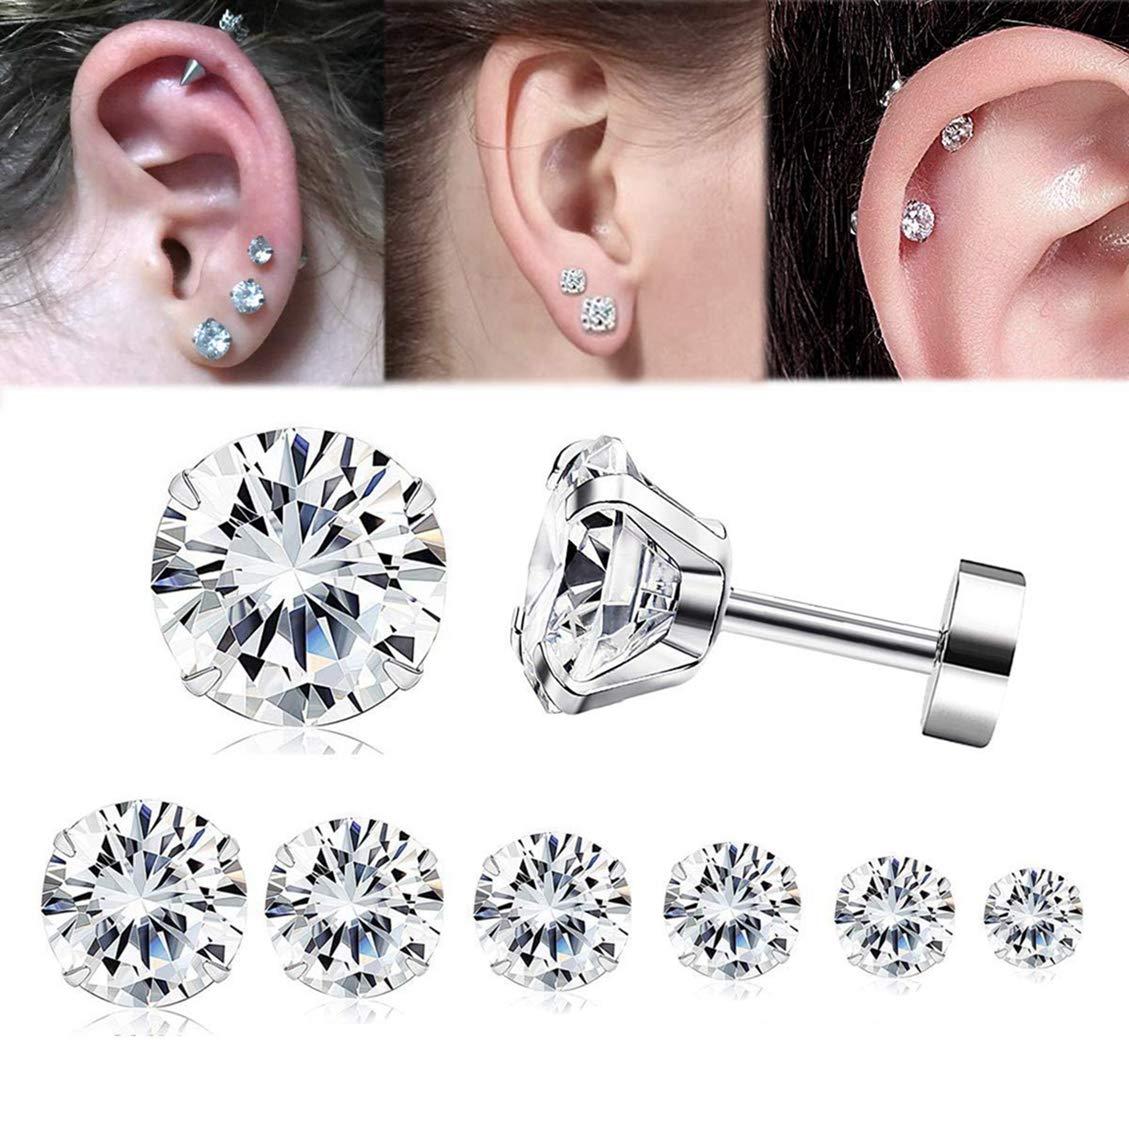 Yadoca 4-7 Pairs 20G(0.8 MM) Stainless Steel Zircon Cartilage Earrings for Men Women Tragus Stud Earrings Shiny CZ